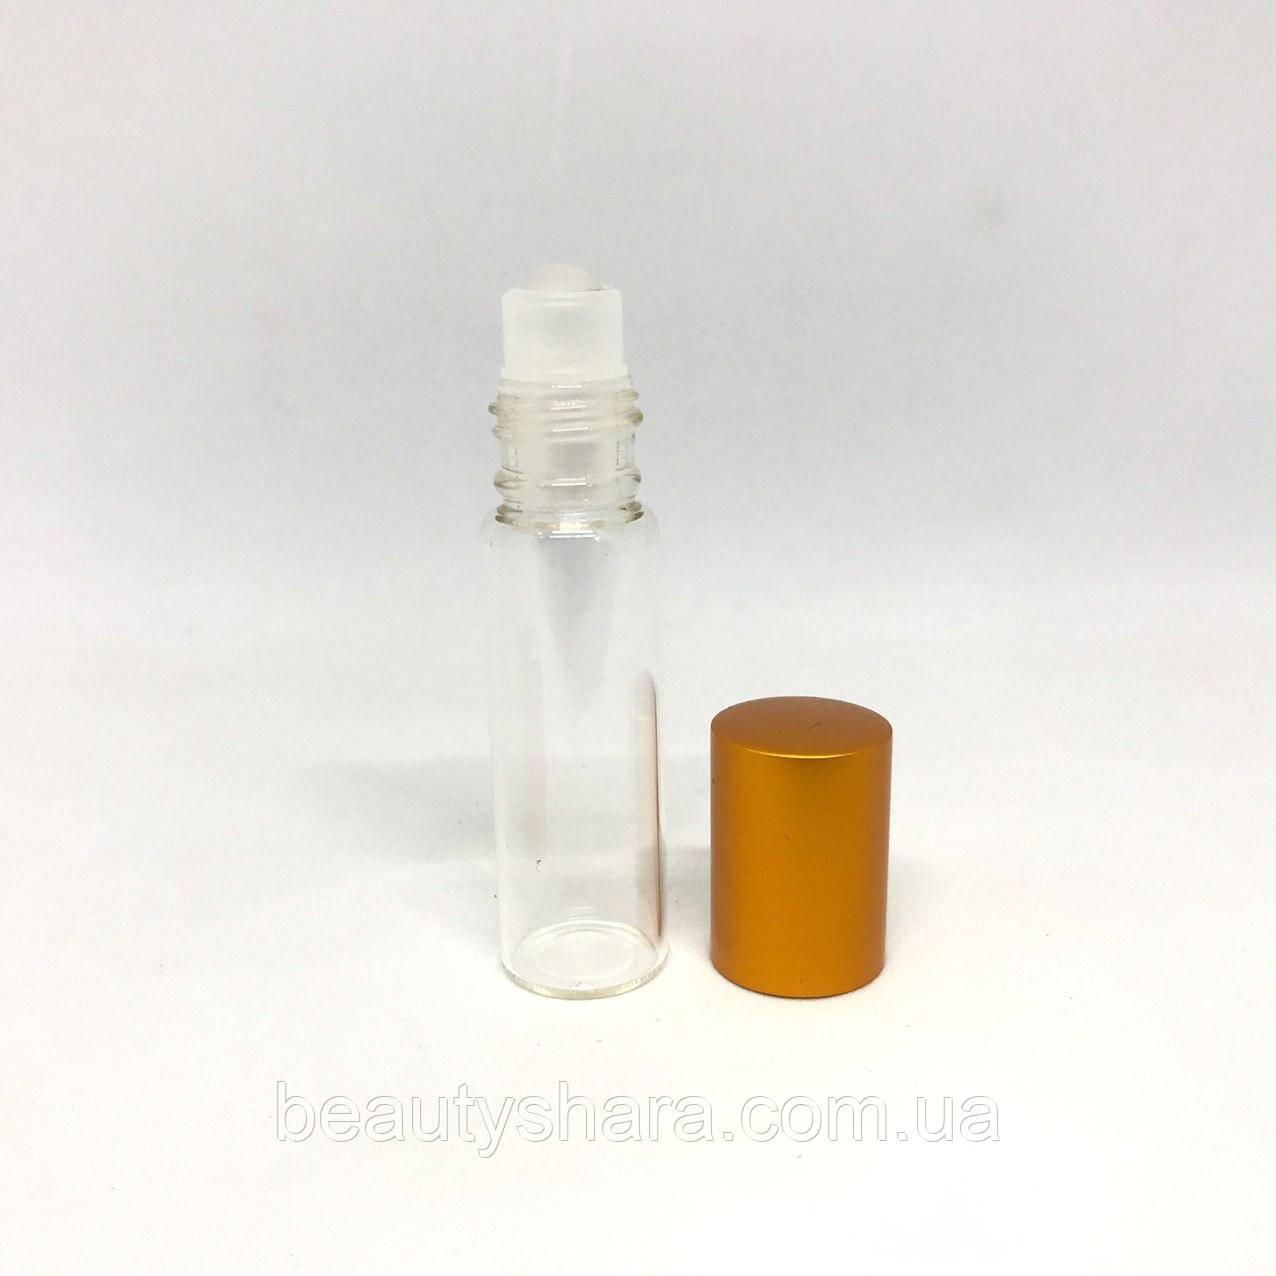 Флакон стеклянный 10 мл «Роллон»